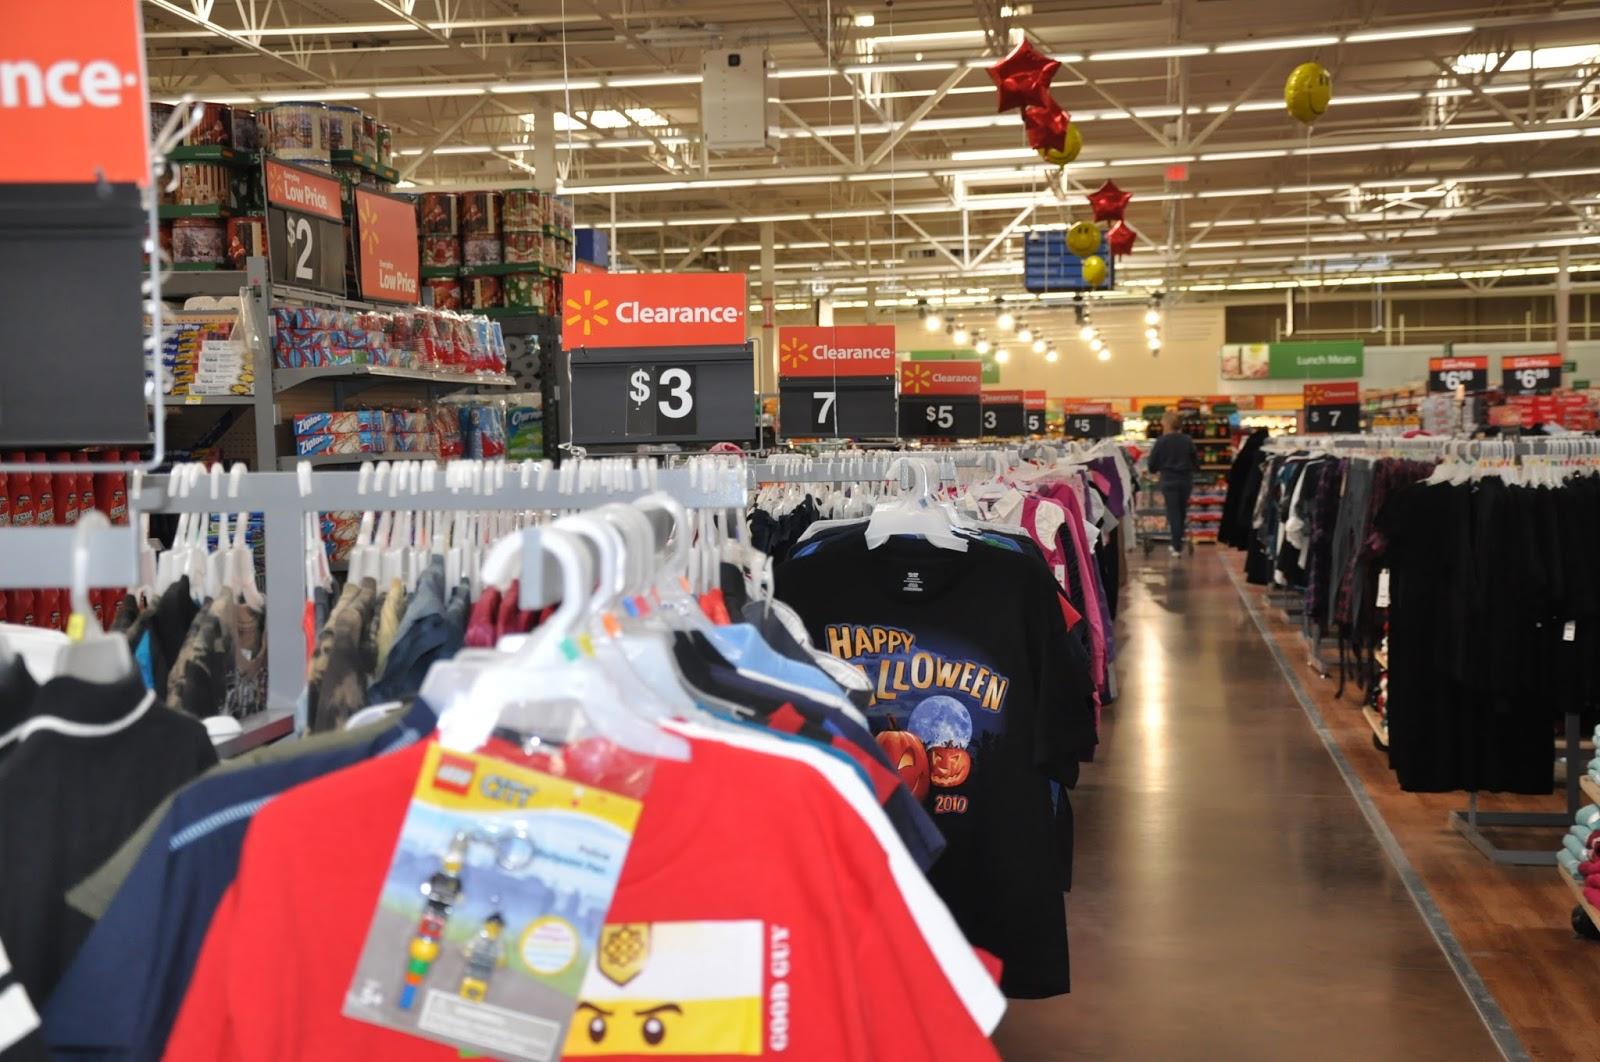 walmart clothes prices